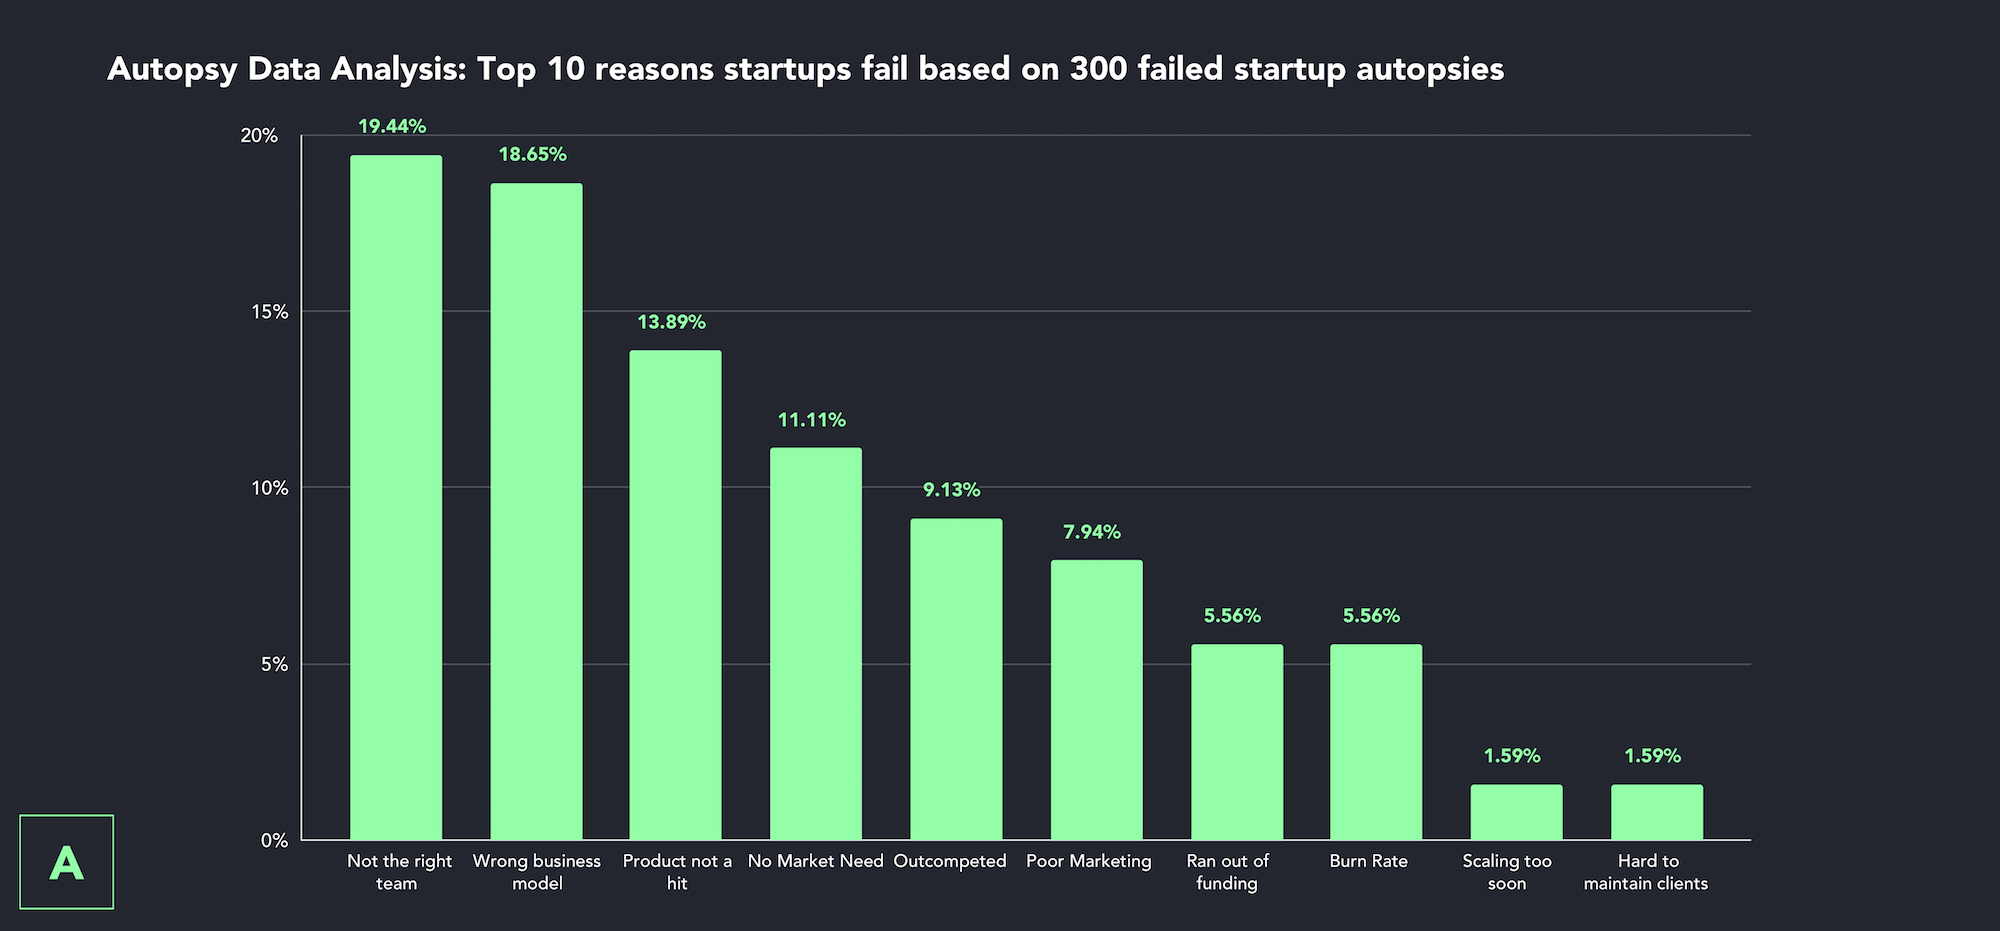 Top 10 reasons for failure based on 300 failed startups via Autopsy